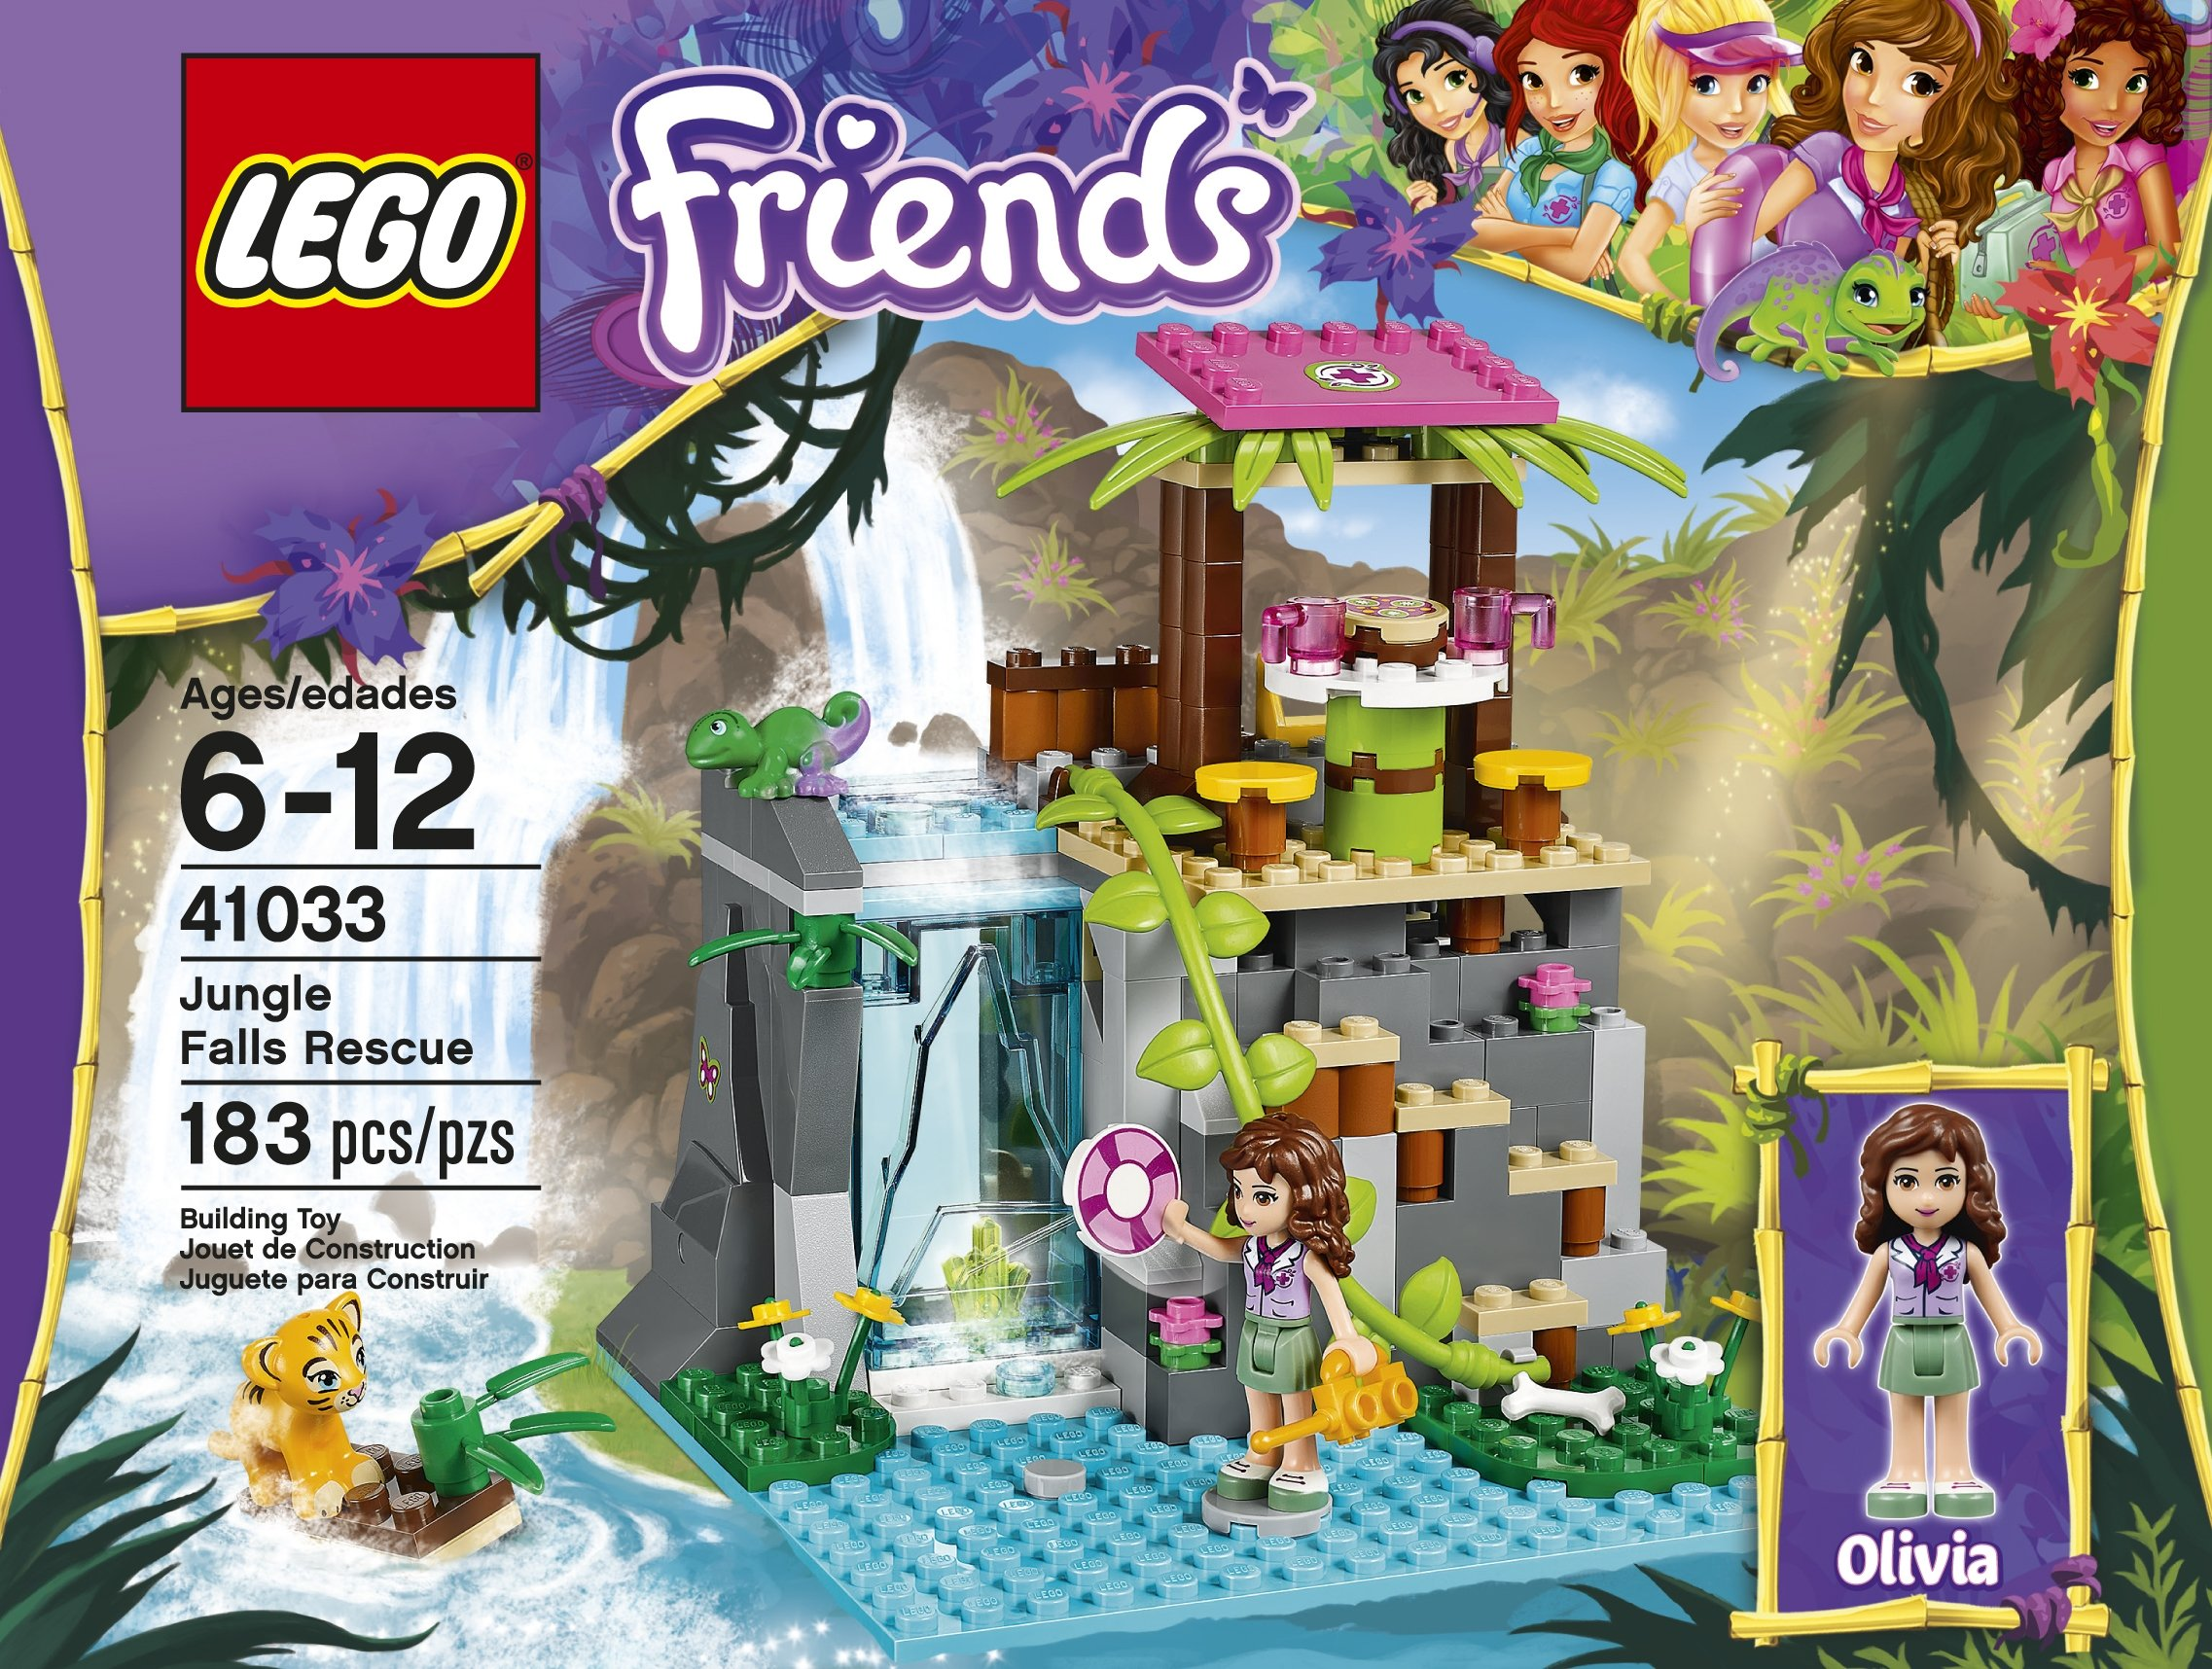 LEGO Friends Jungle Falls Rescue 41033 Building Set ...